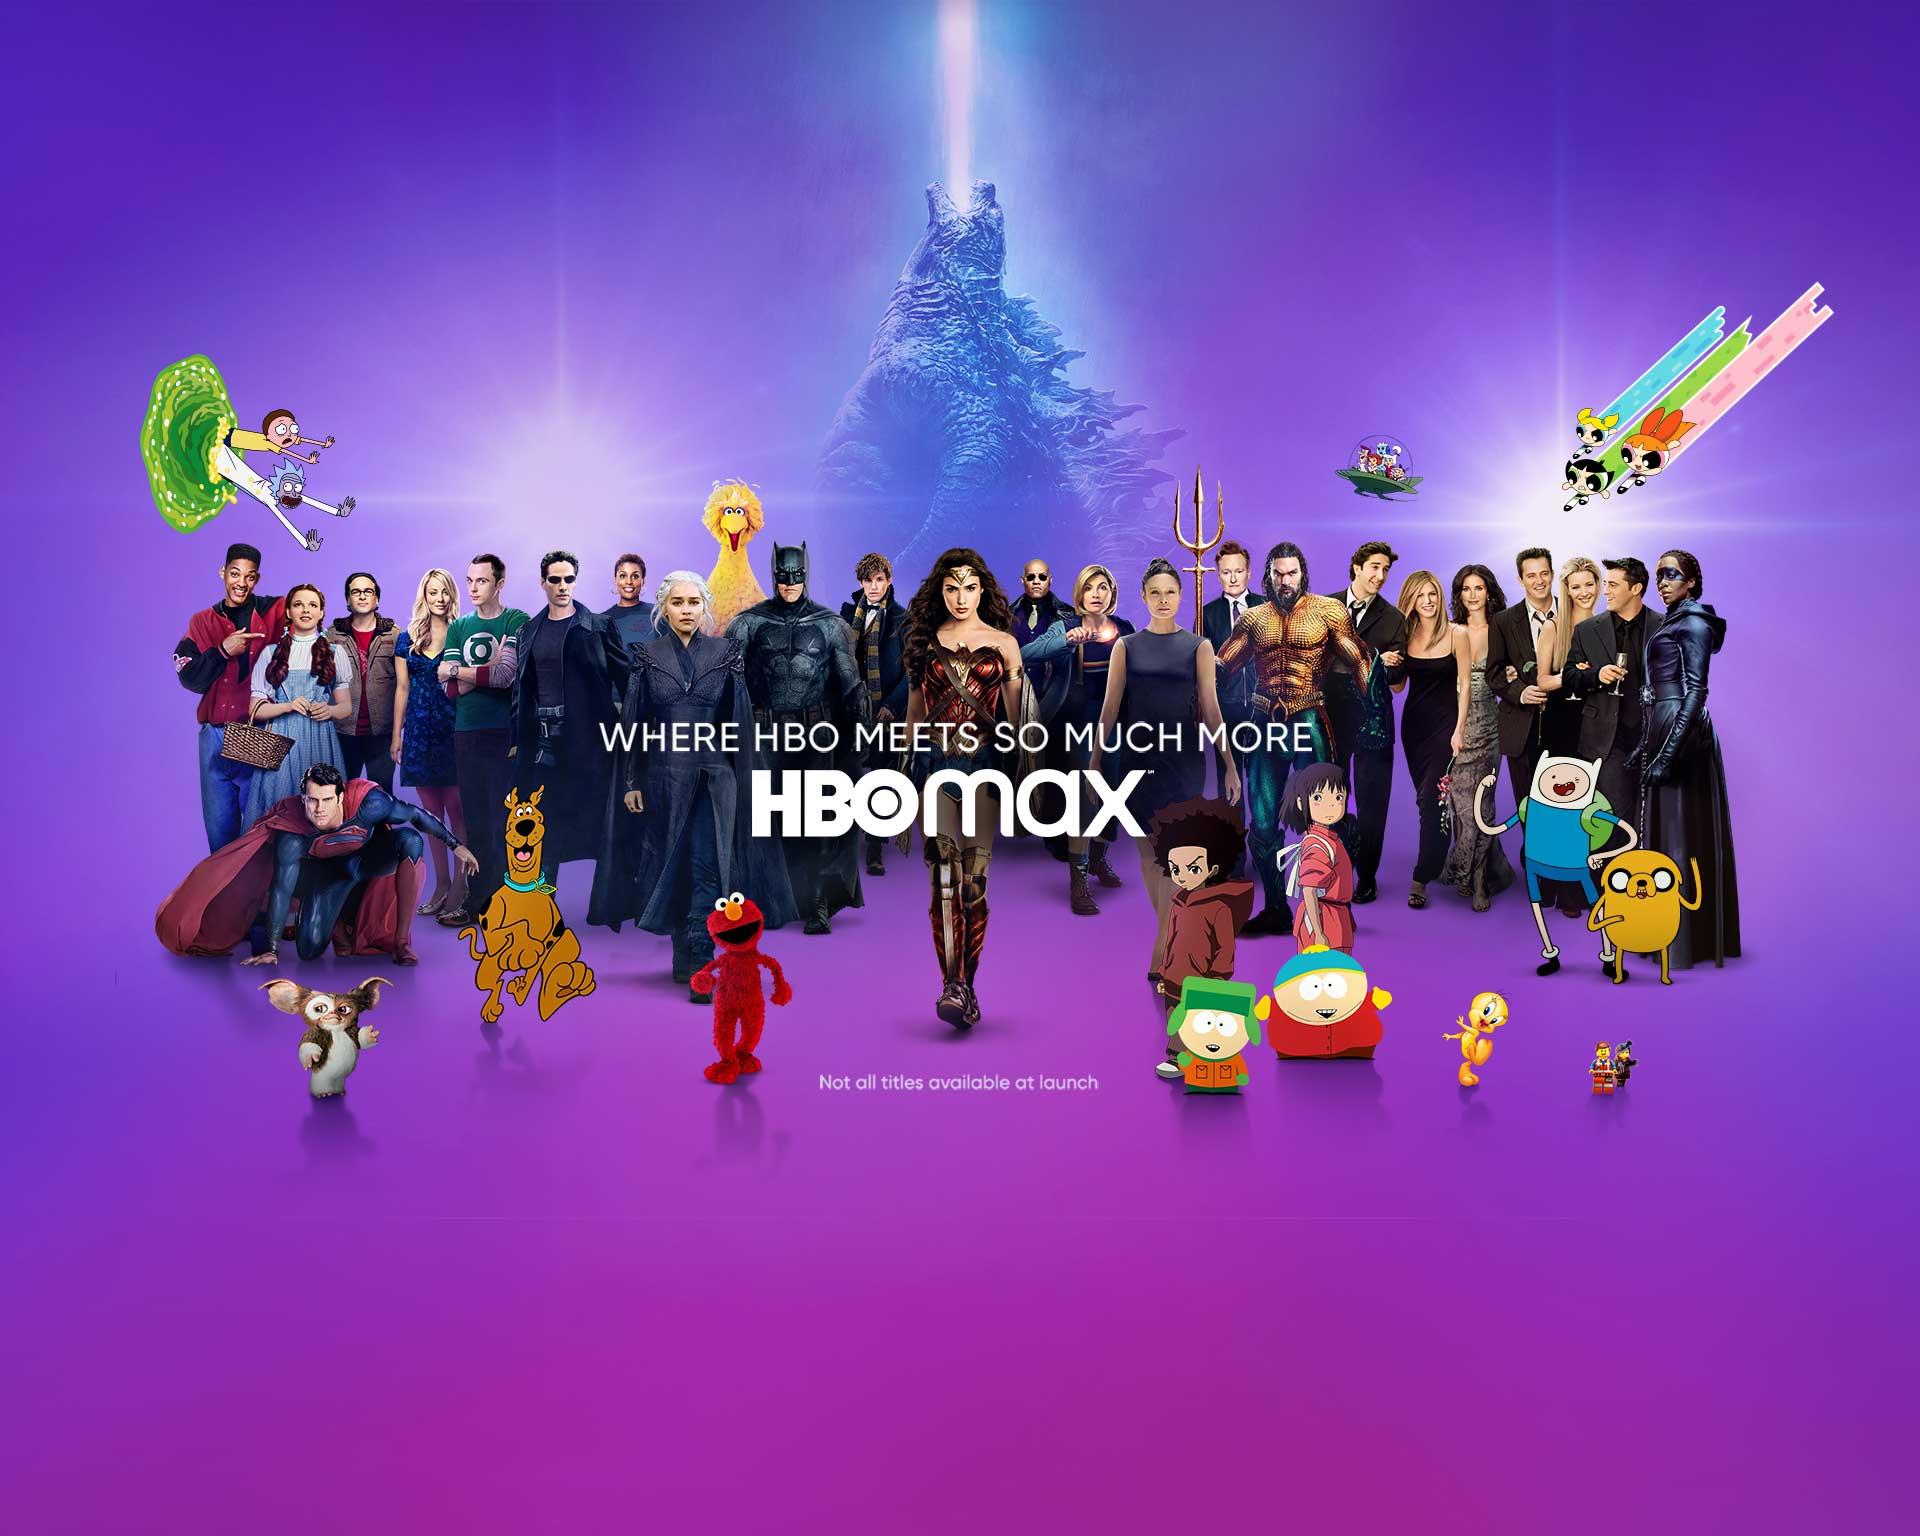 HBO Max | Tudo sobre o serviço da Warner, HBO e DC Comics